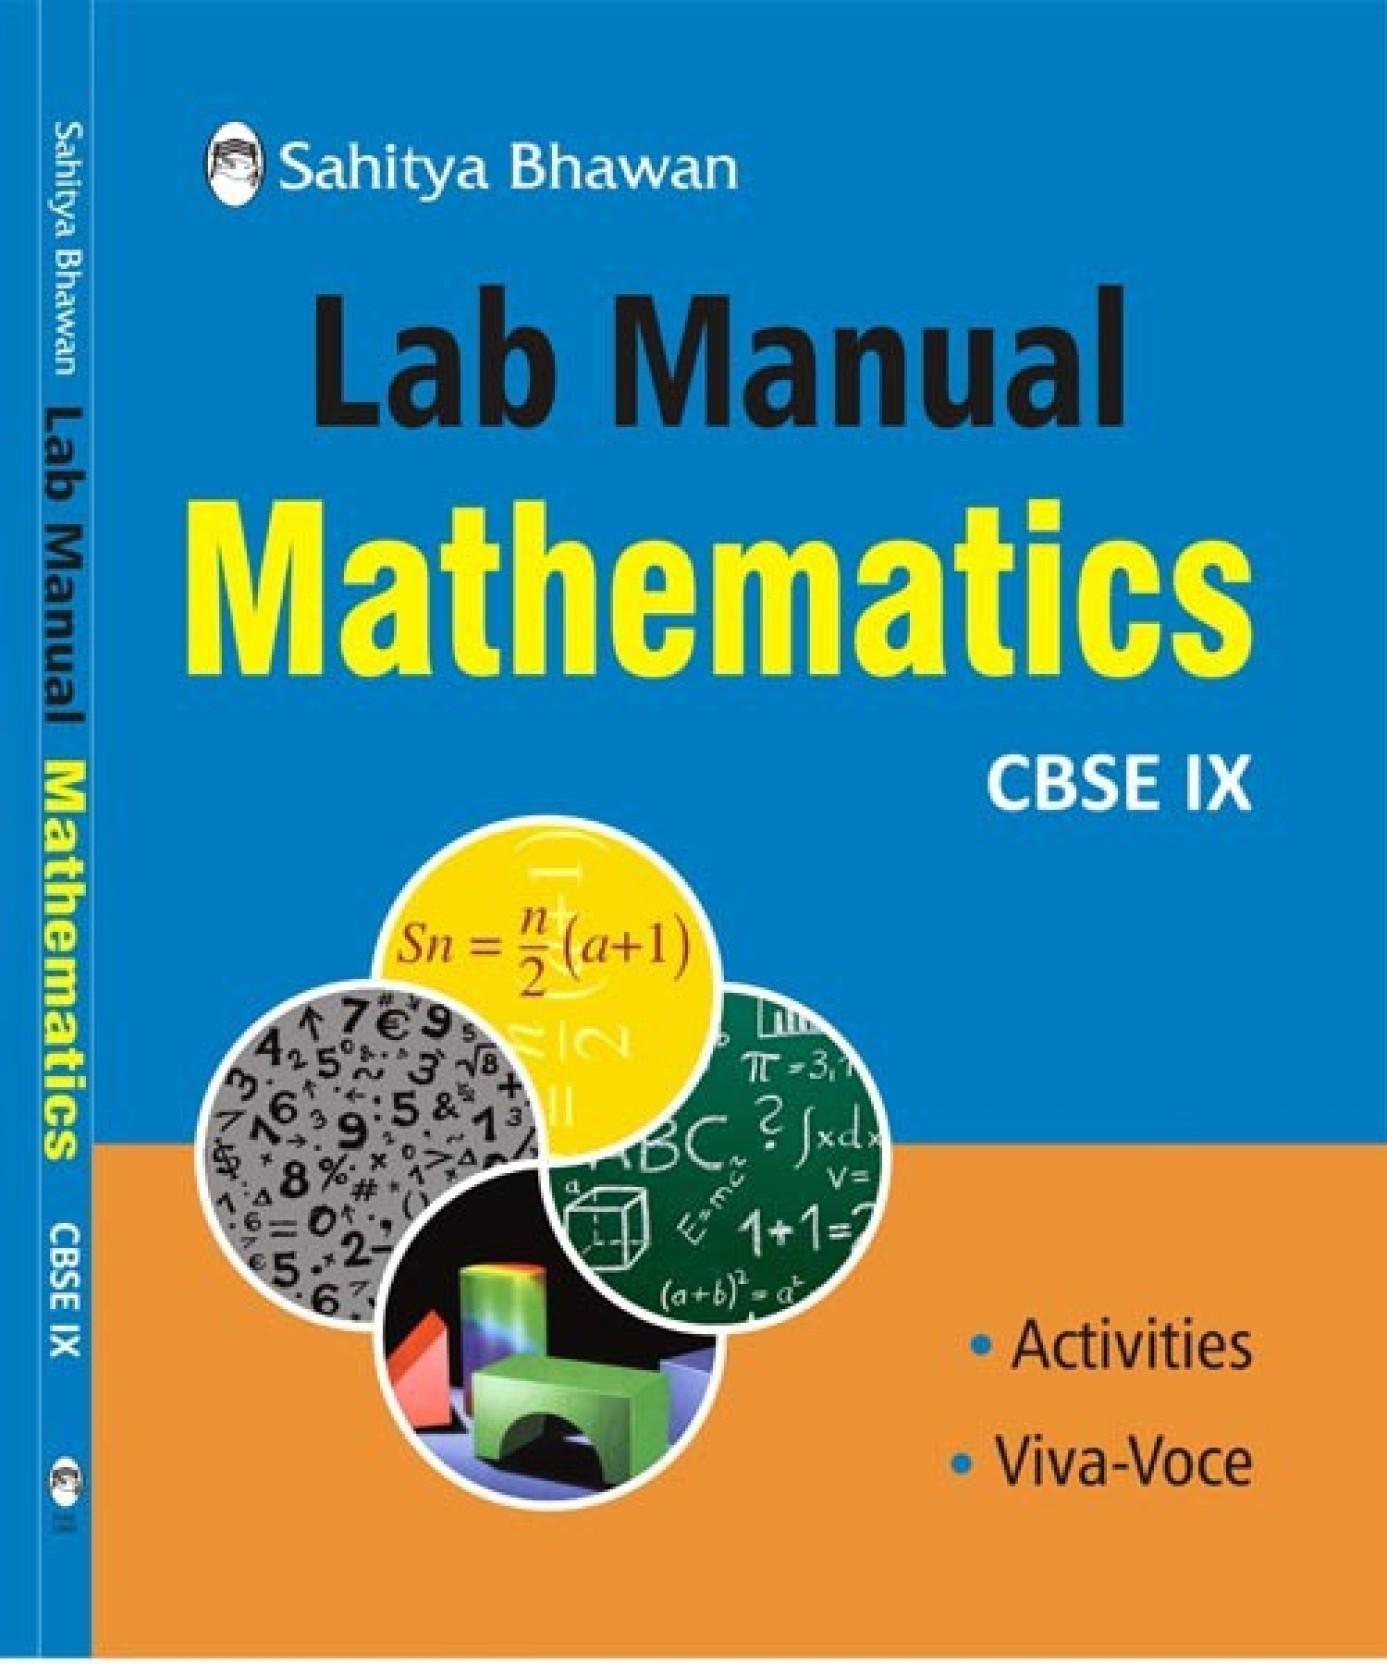 Lab Manual MATHEMATICS Class IX. ADD TO CART